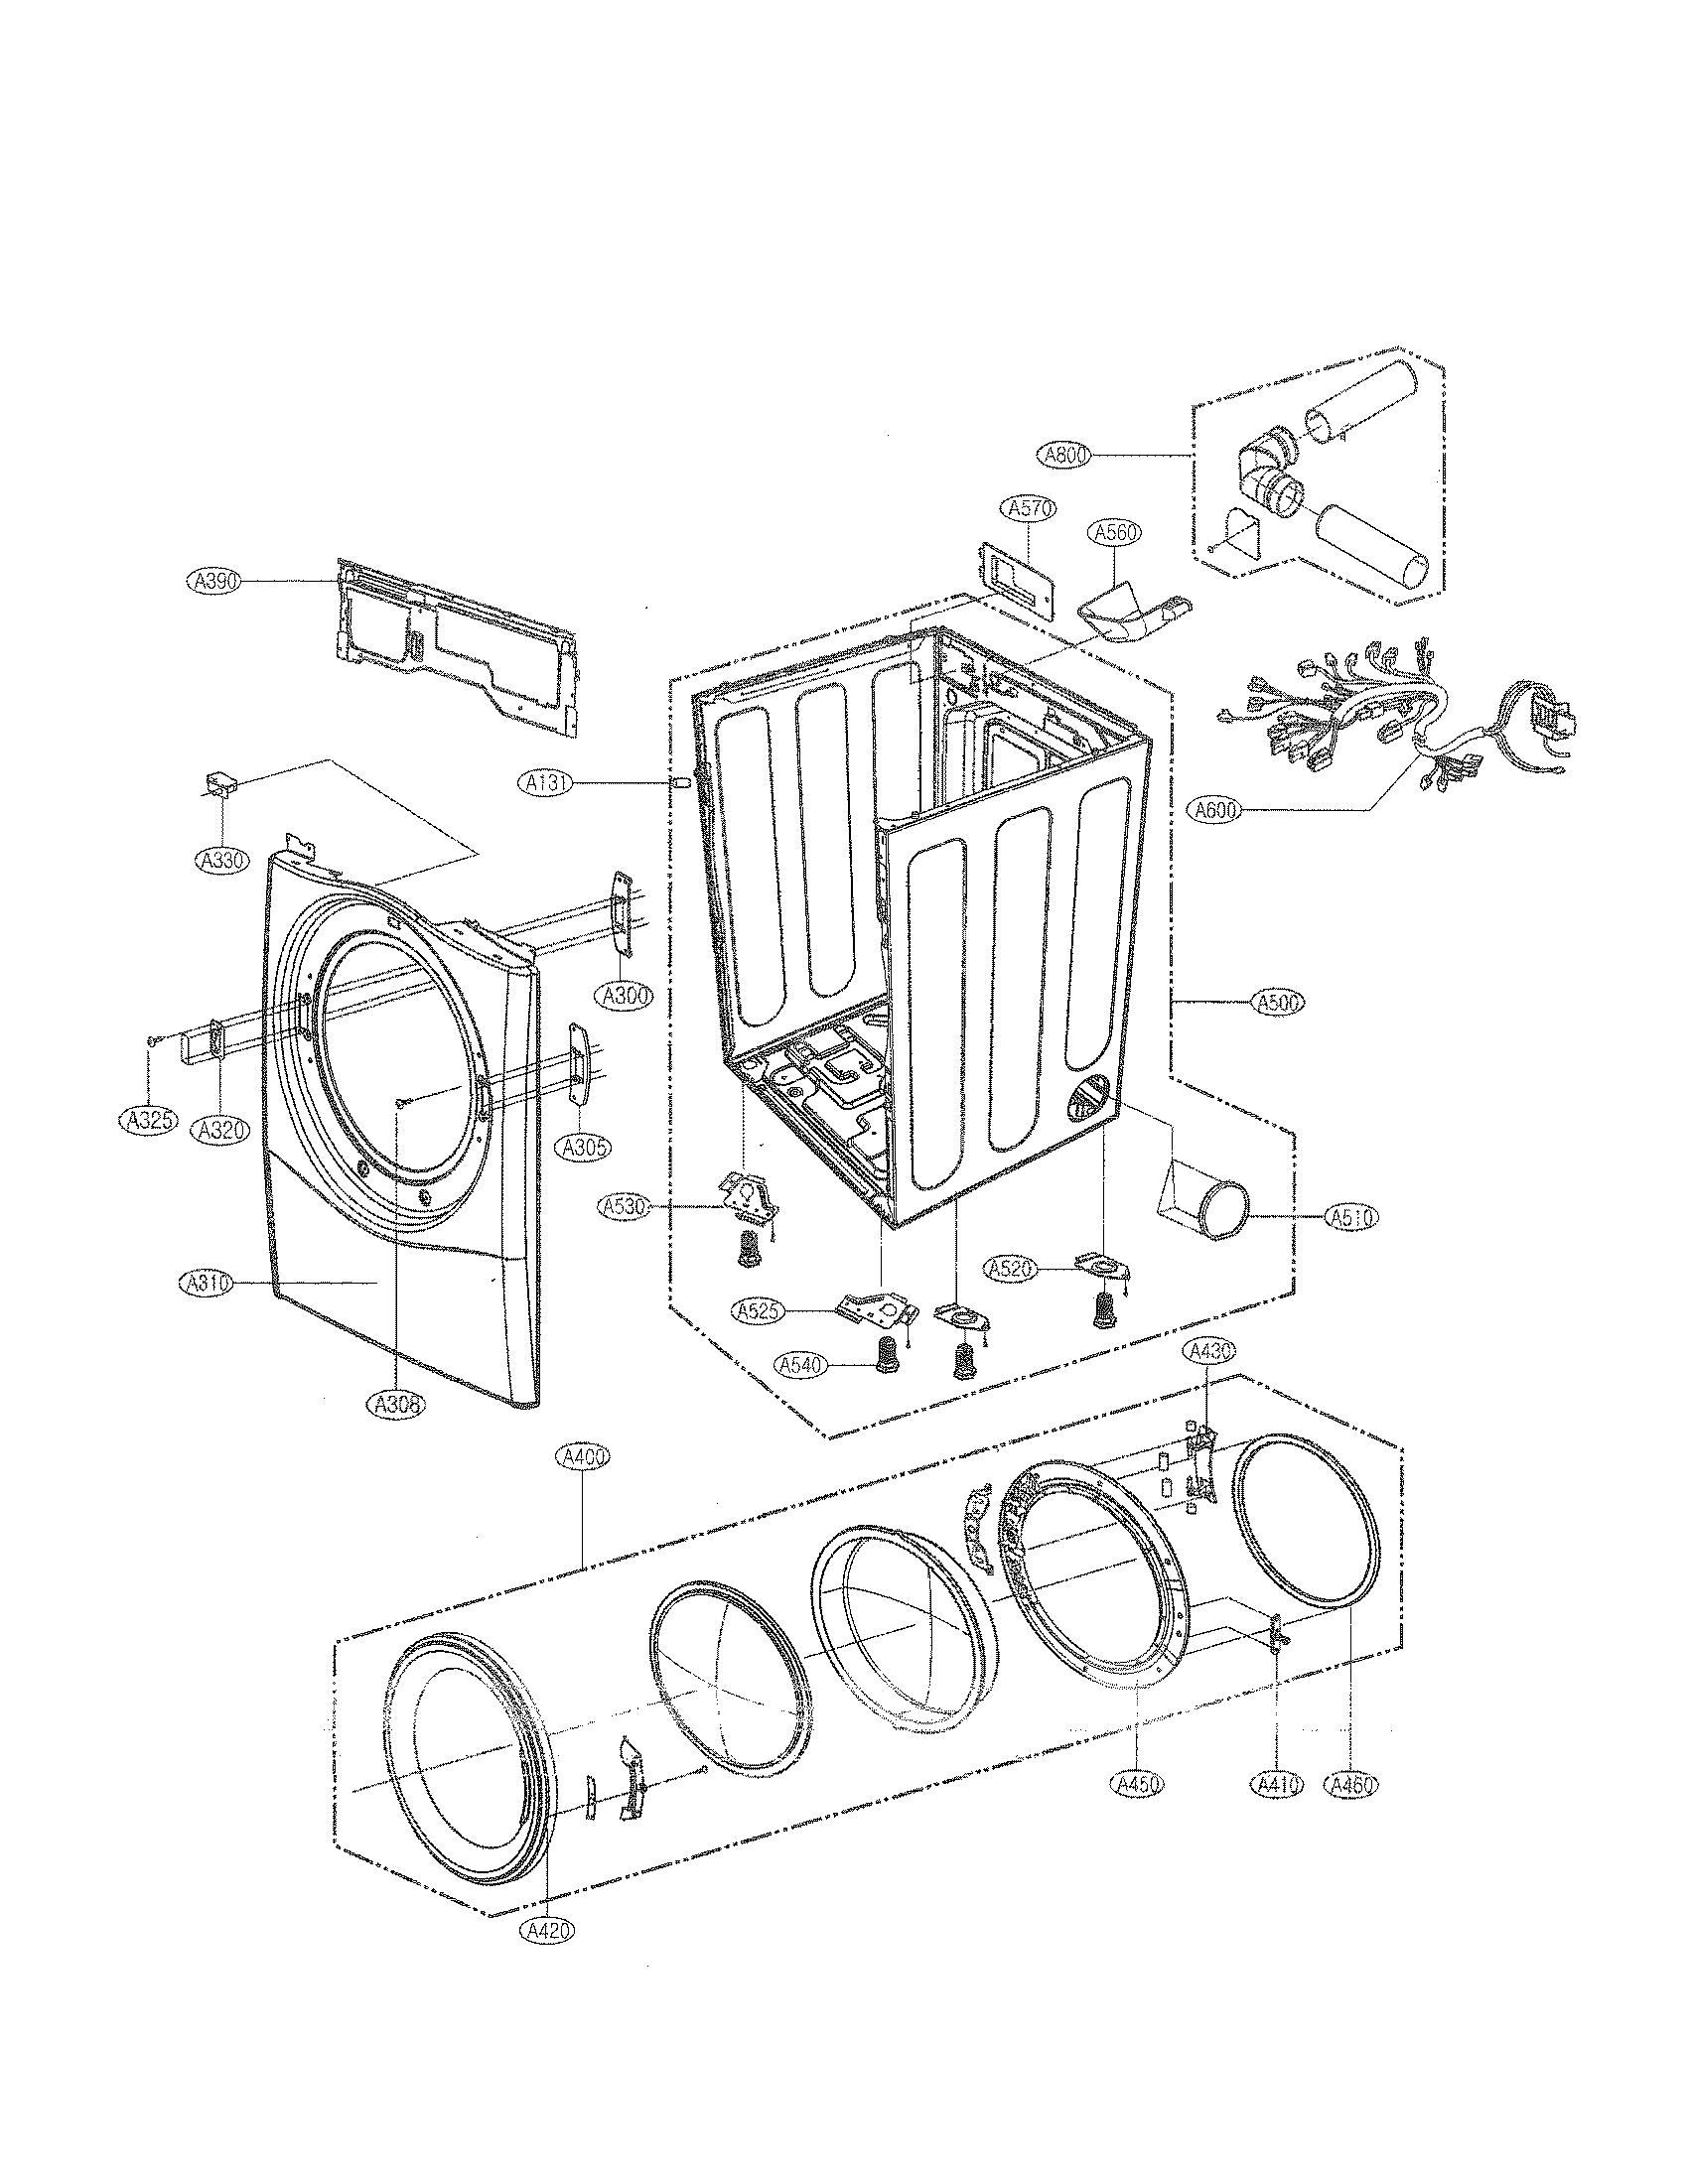 Lg model DLE2350R residential dryer genuine parts